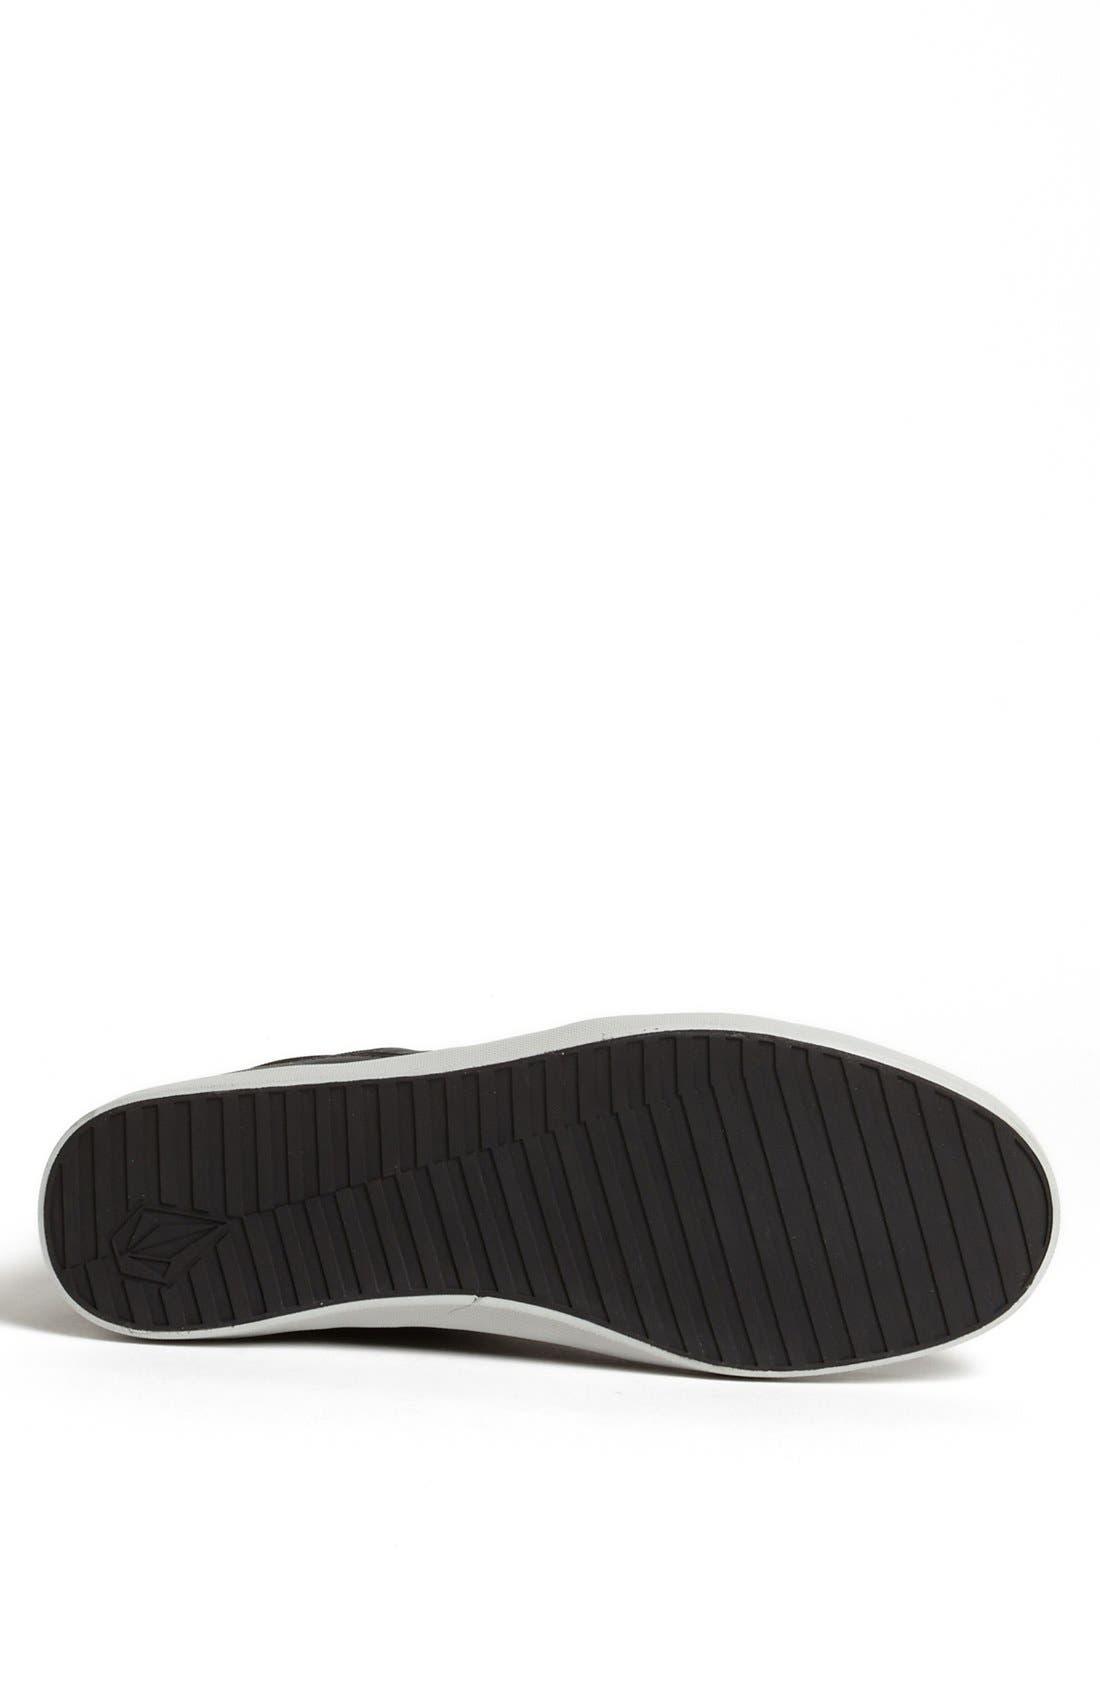 Alternate Image 4  - Volcom 'Grimm' High Top Sneaker